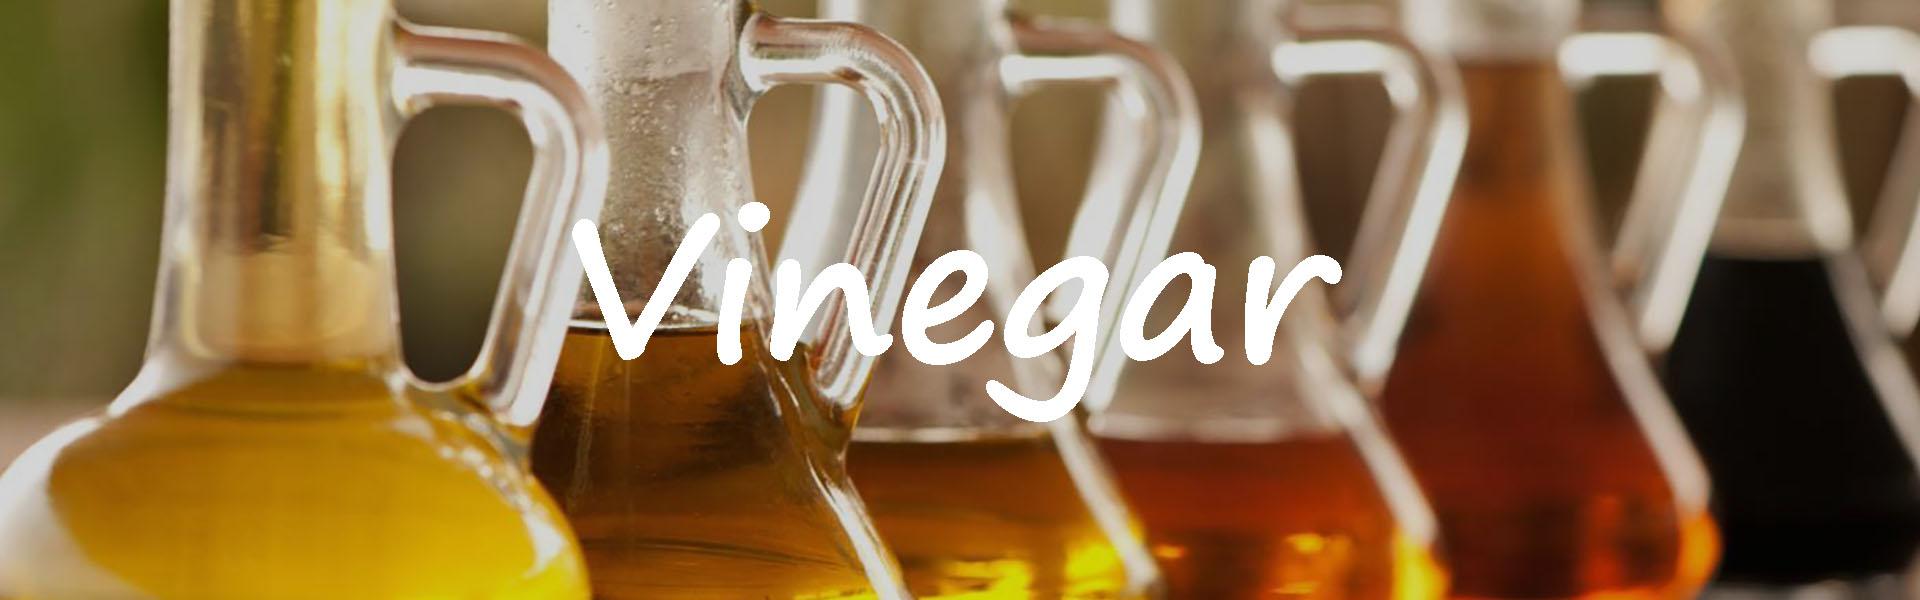 web-ready-vinegar-1